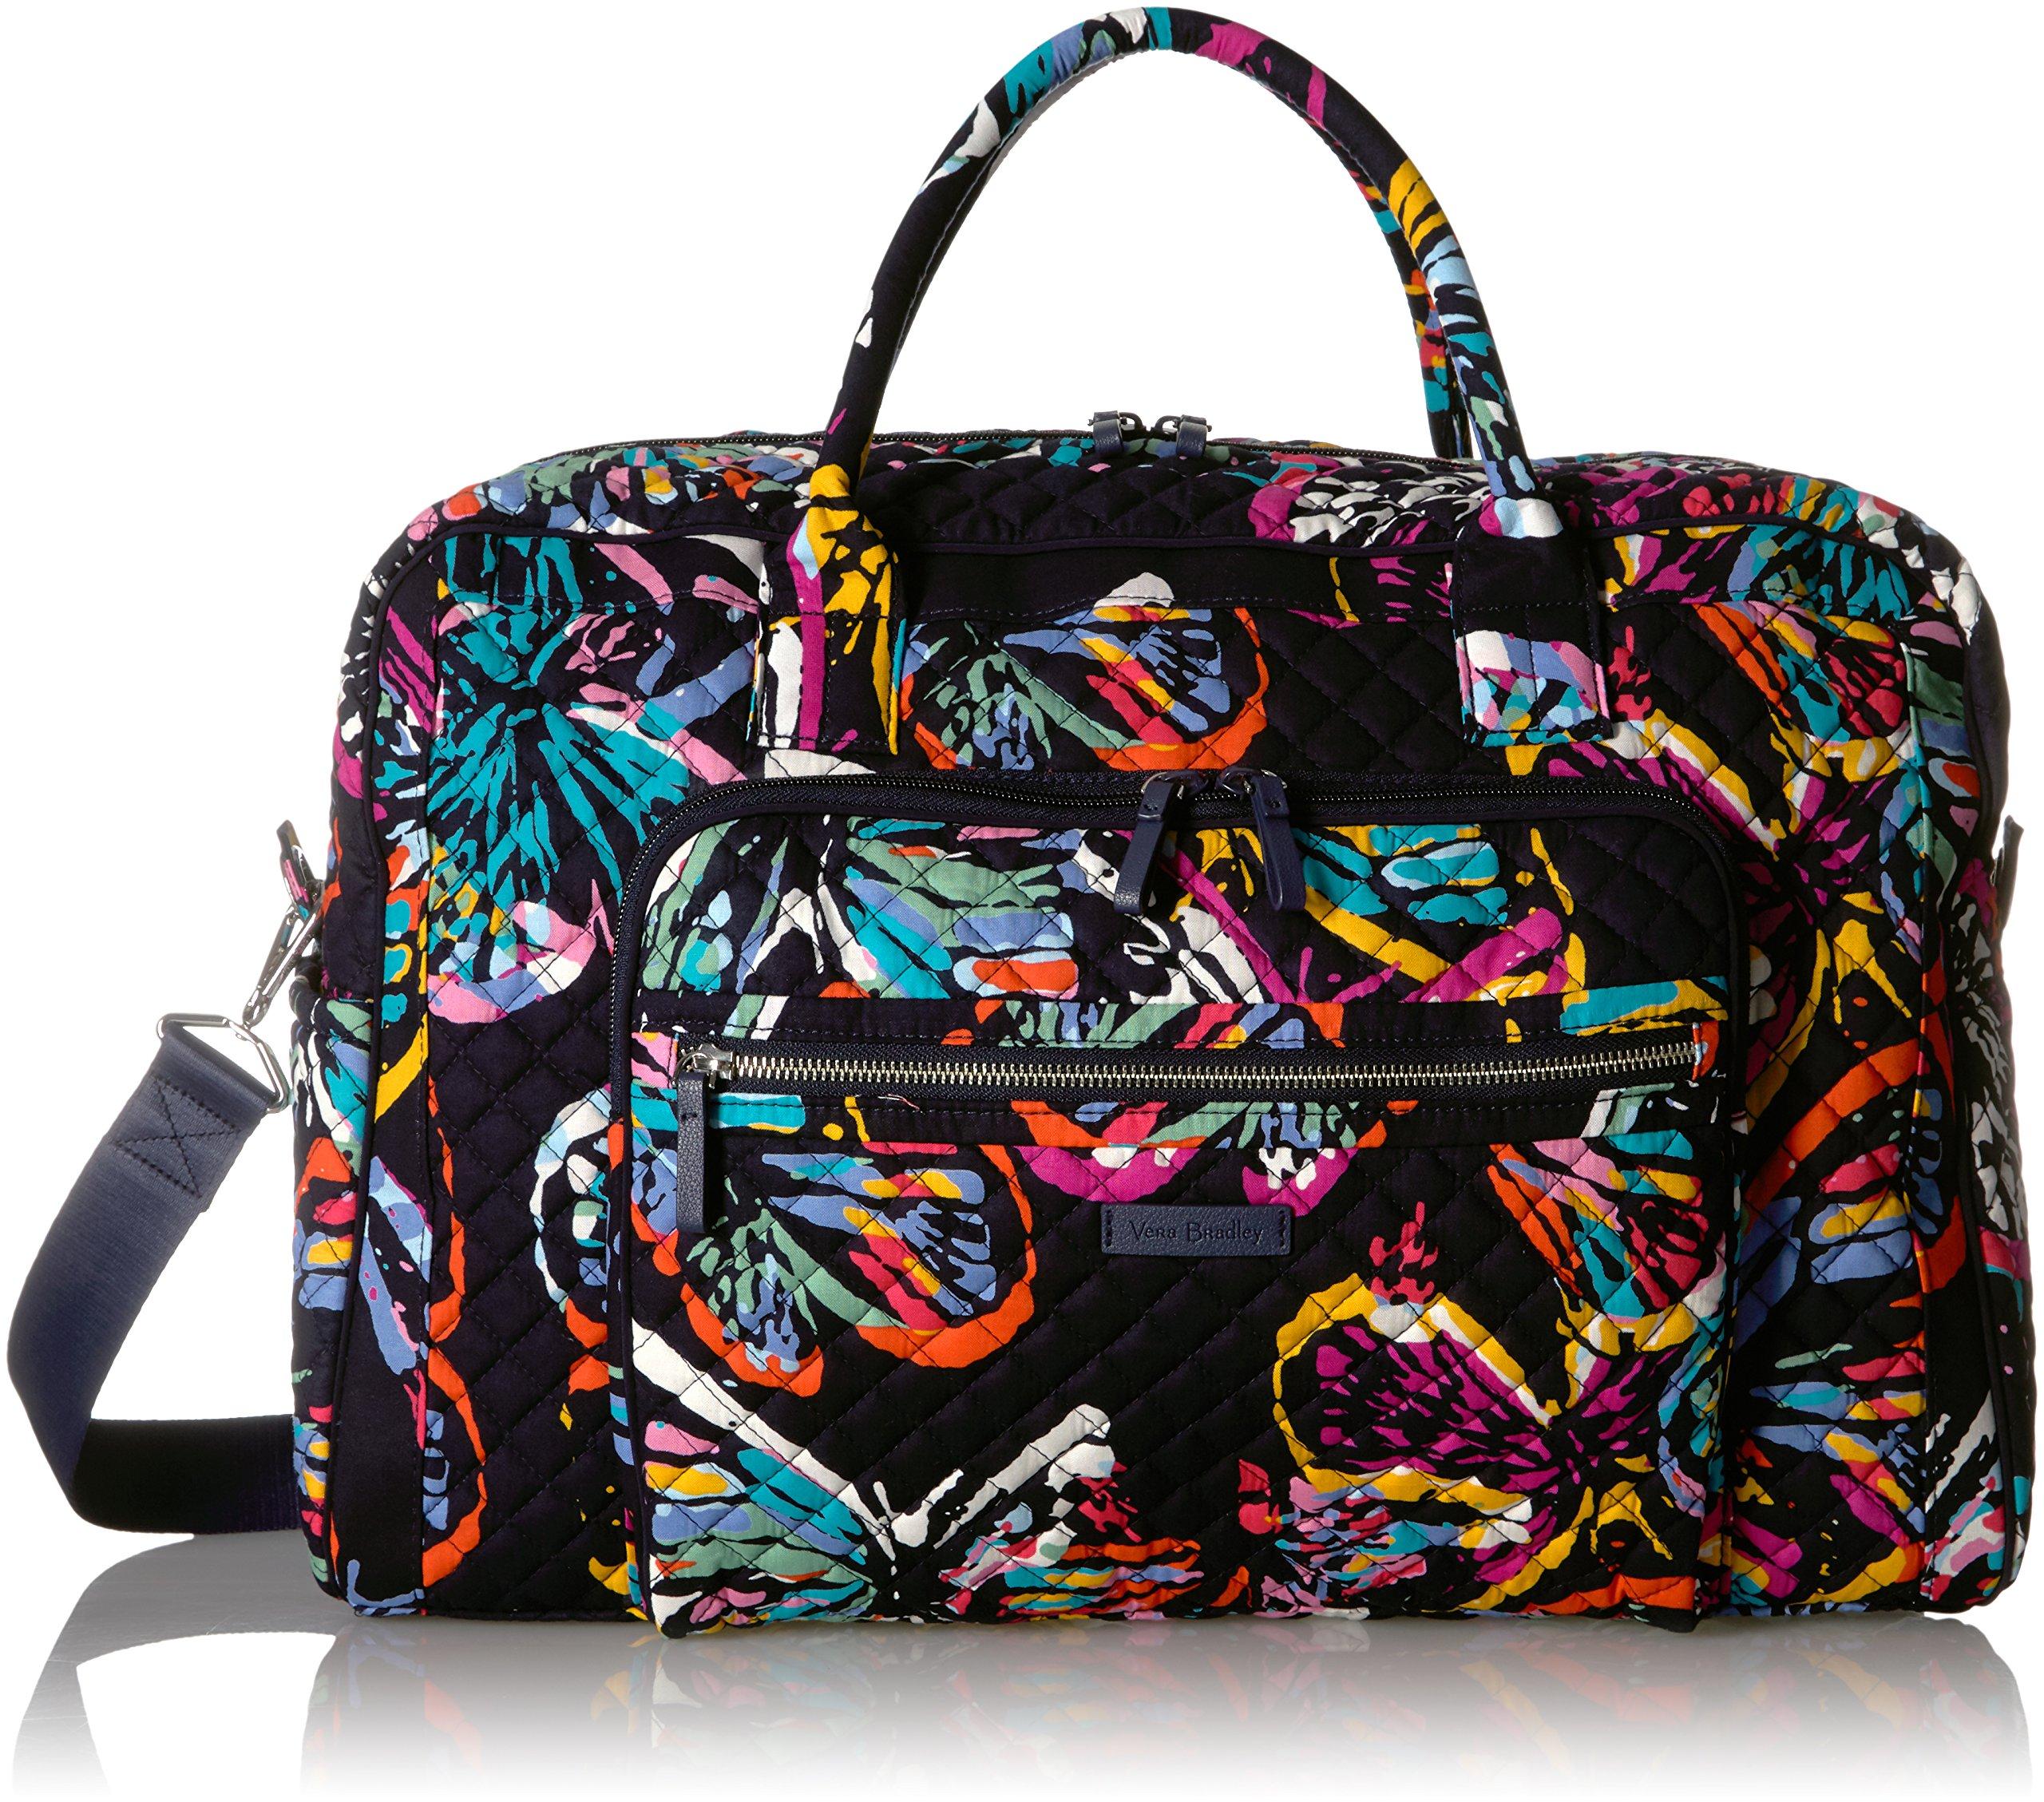 Vera Bradley Iconic Weekender Travel Bag, Signature Cotton, butterfly flutter